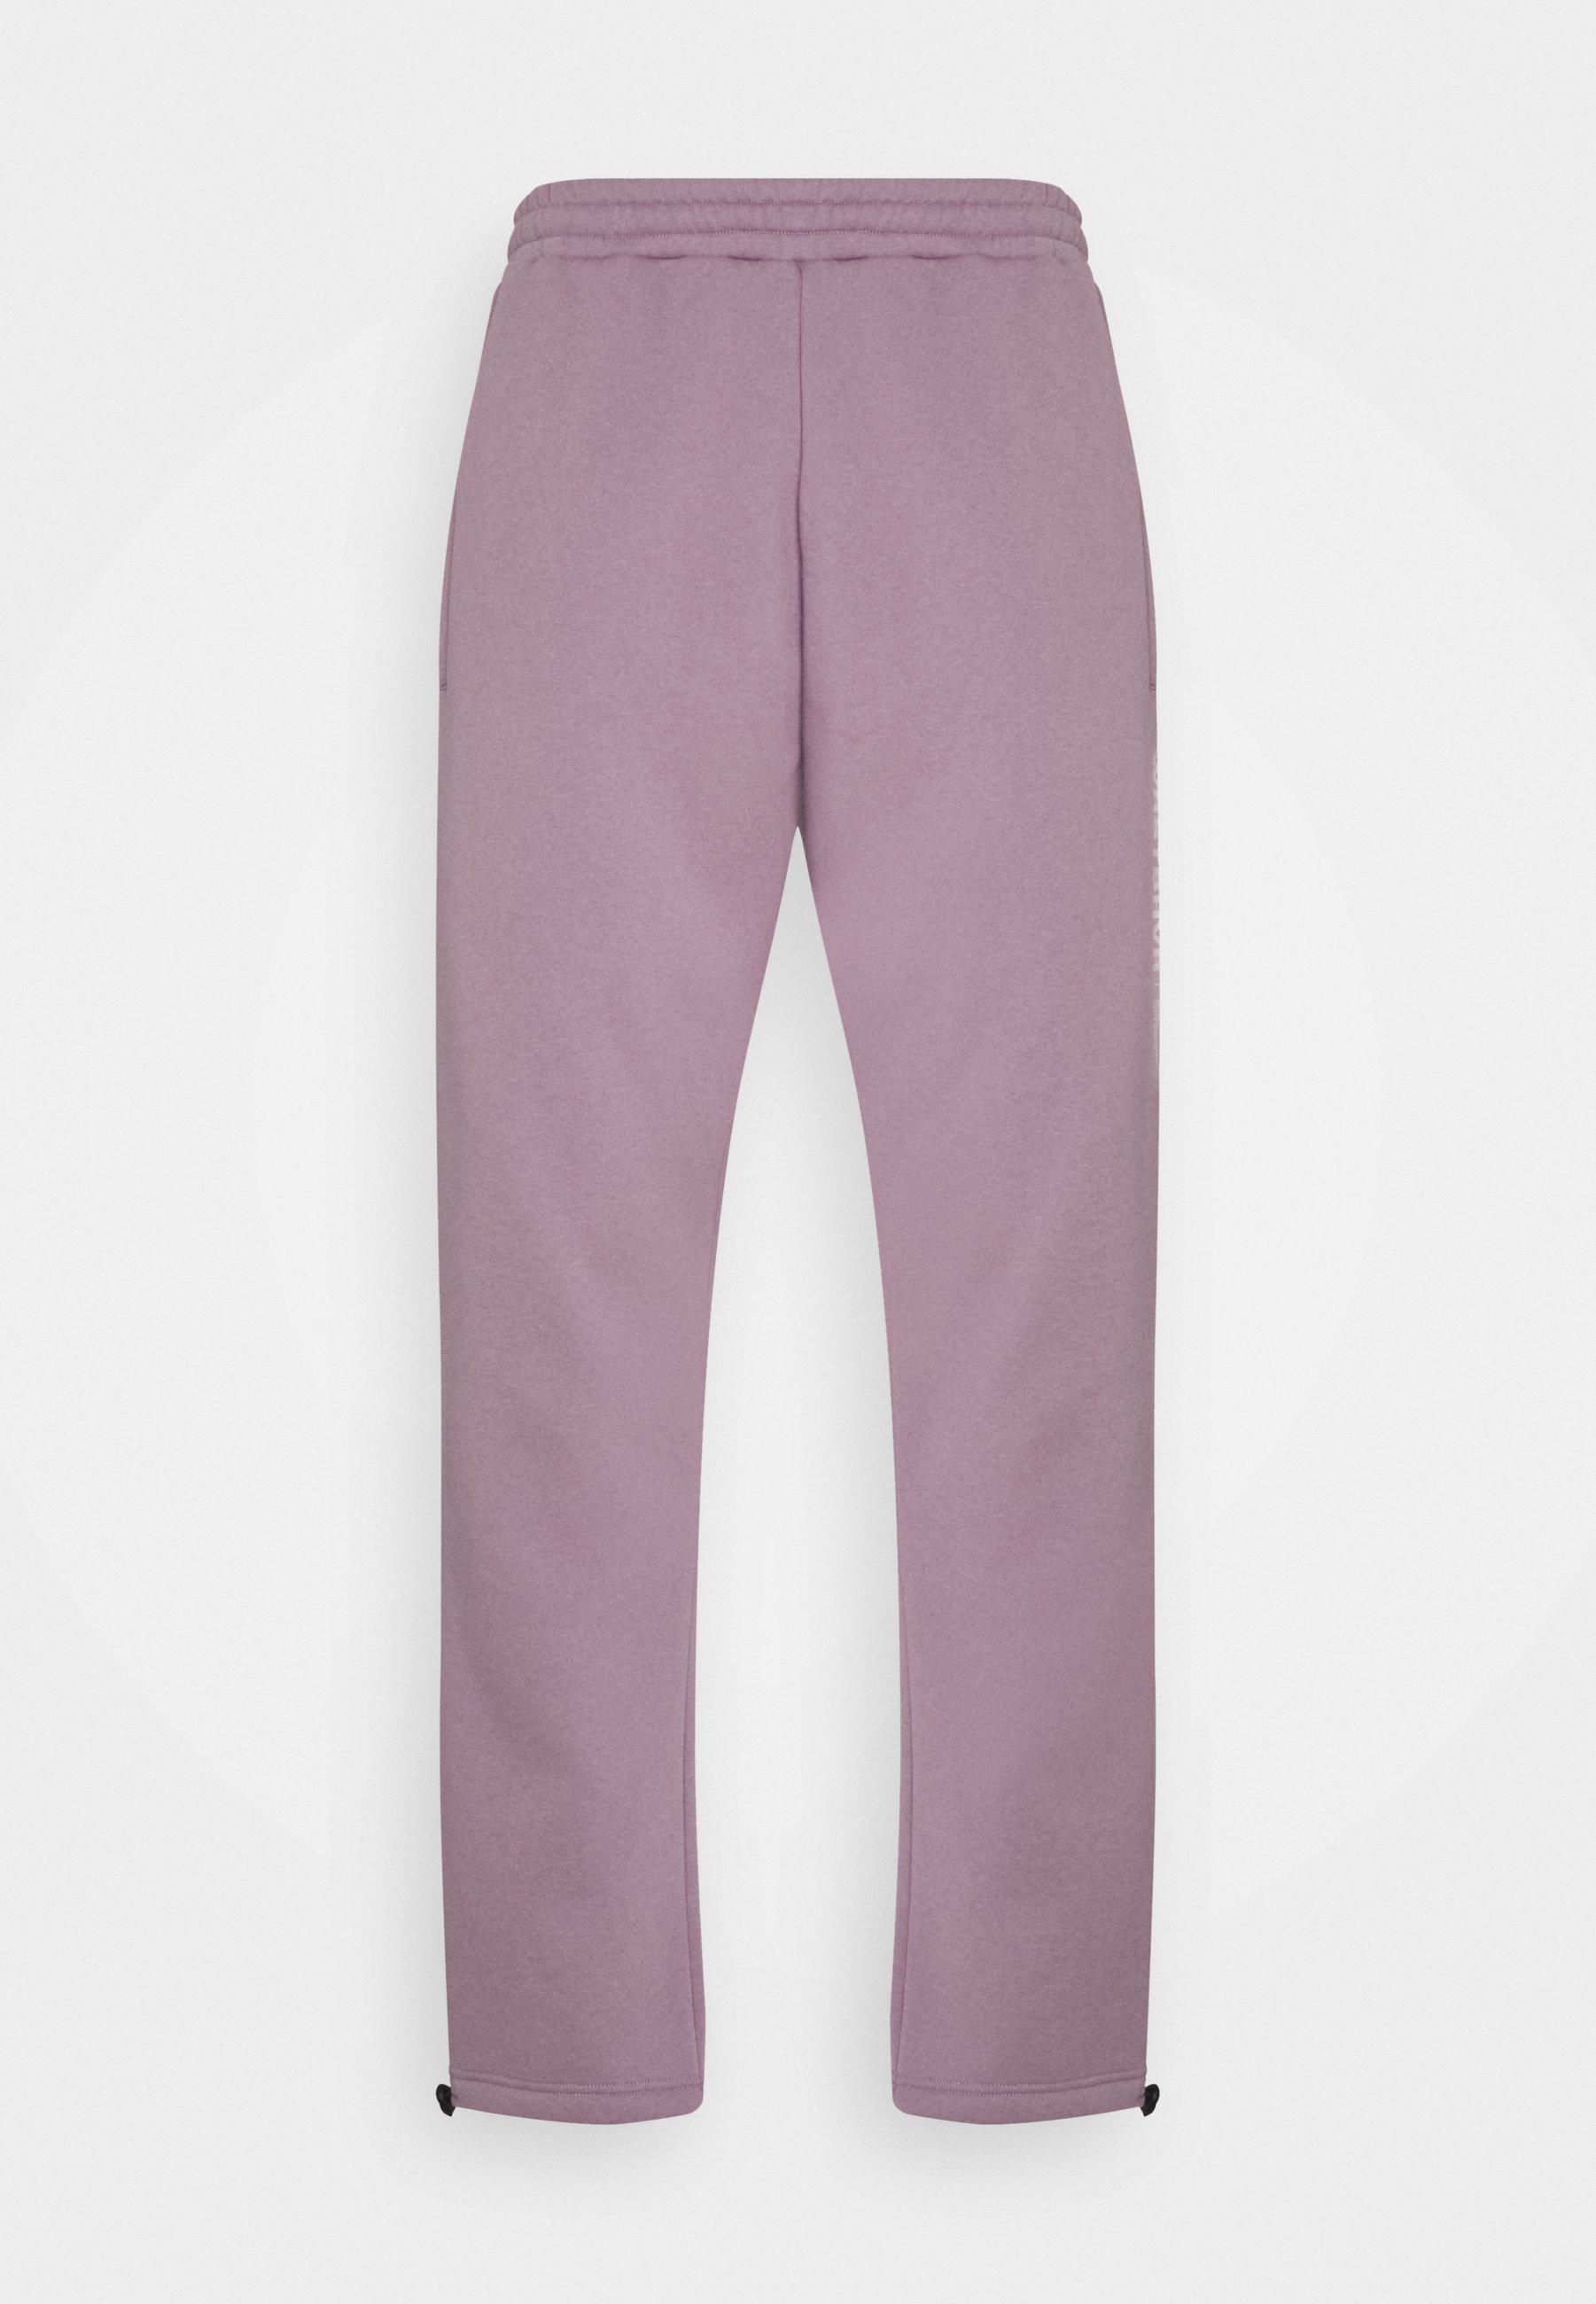 Mujer PANTS UNISEX - Pantalones deportivos